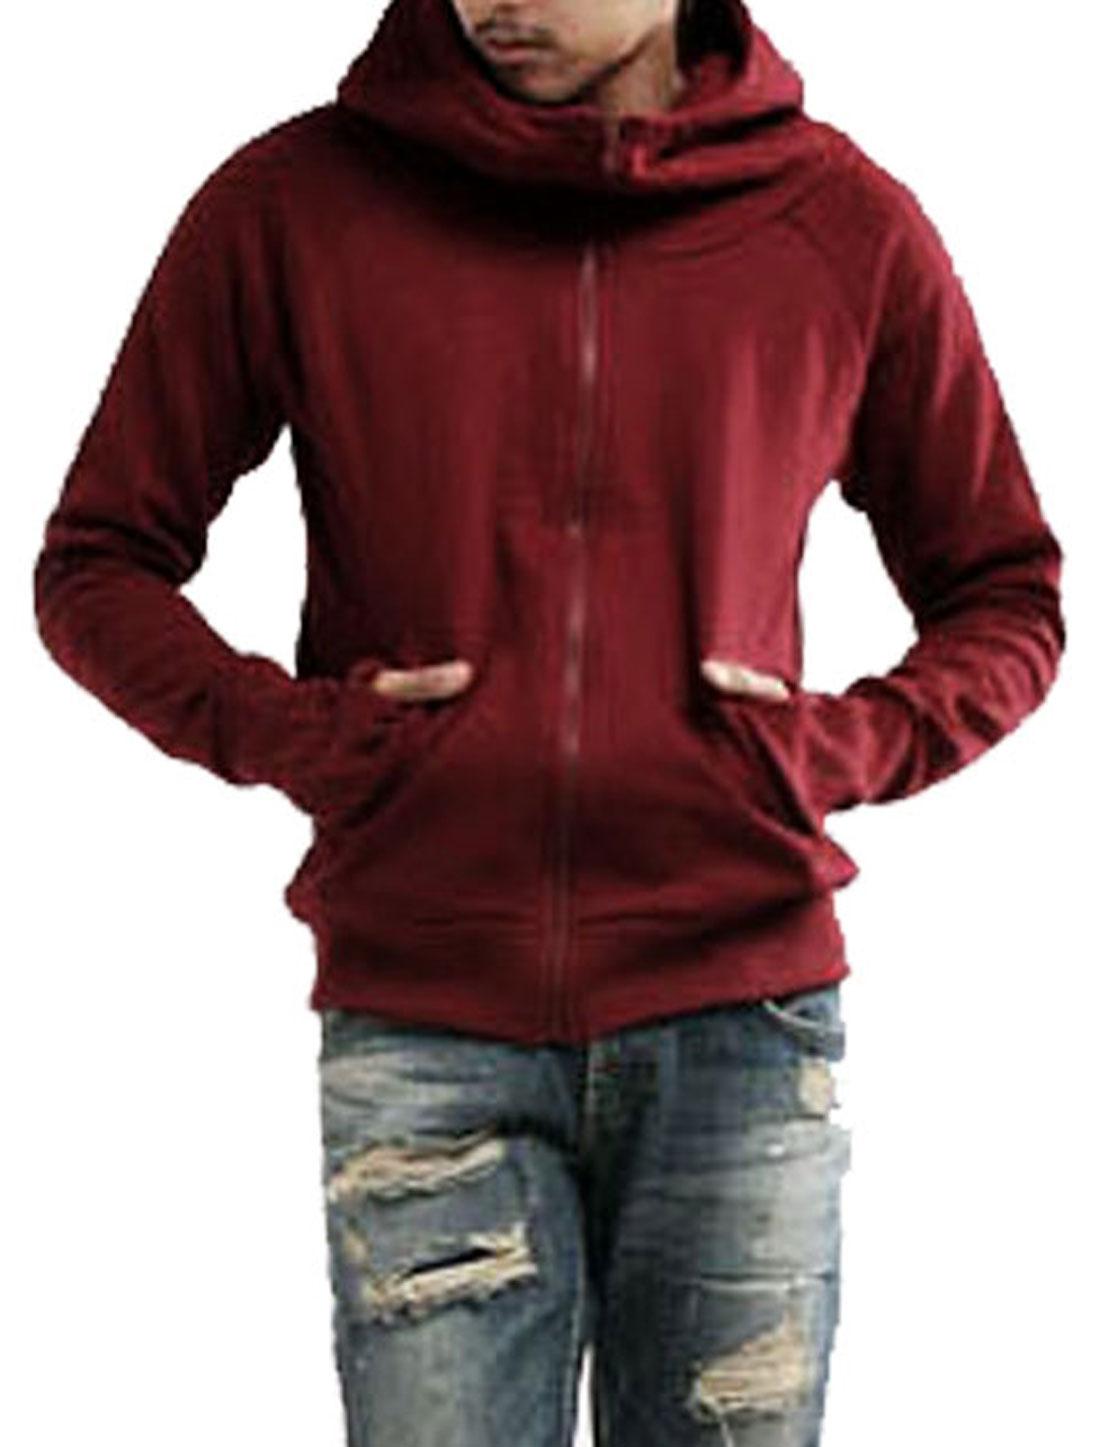 Mens Stylish Casual Hoodie Zipper Jacket Sweatshirt Burgundy M